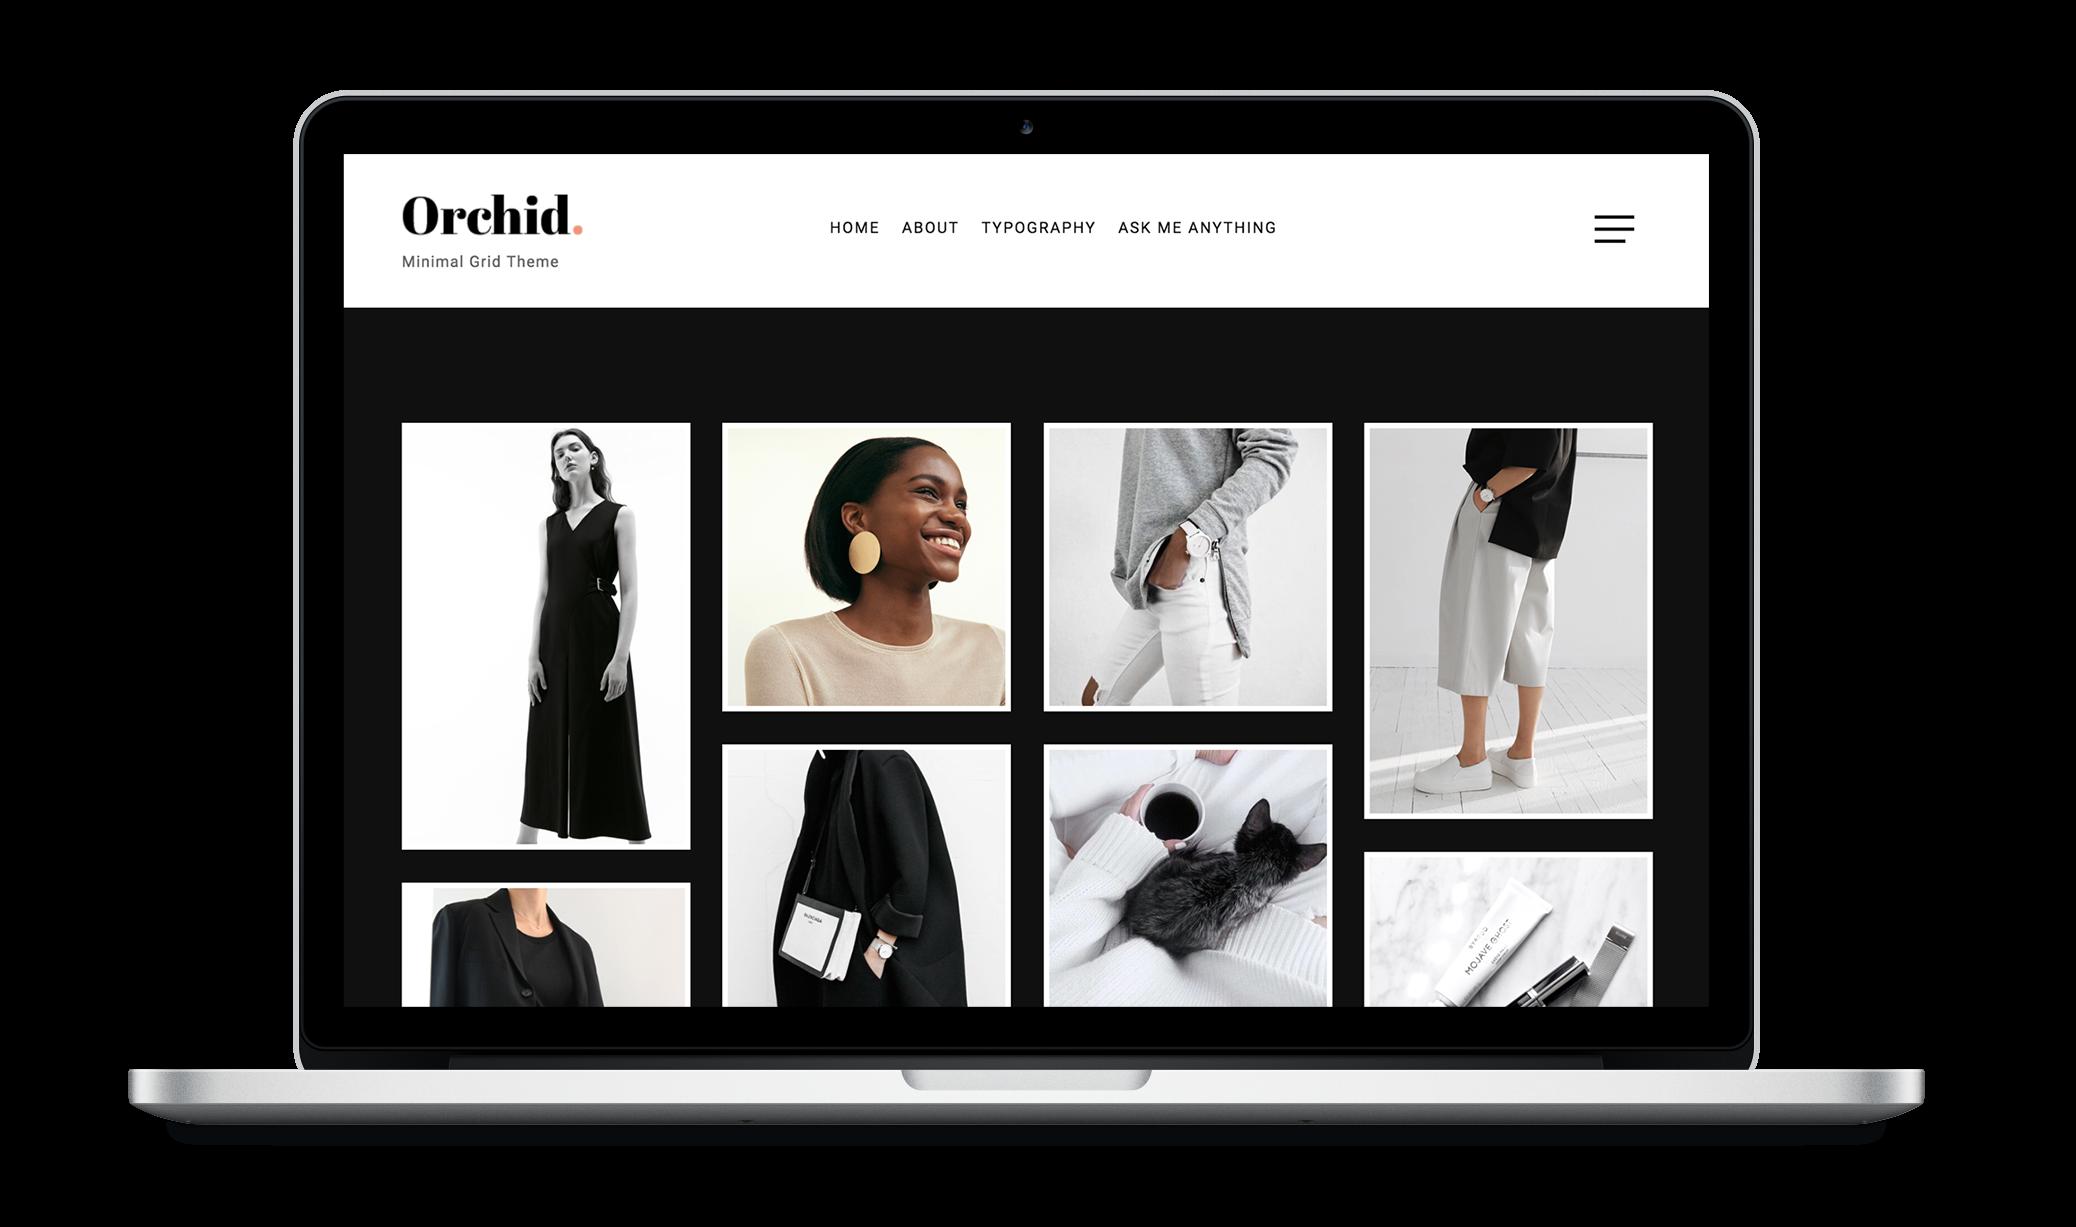 Orchid | Minimal Grid Tumblr Theme | Grid layouts and Minimal